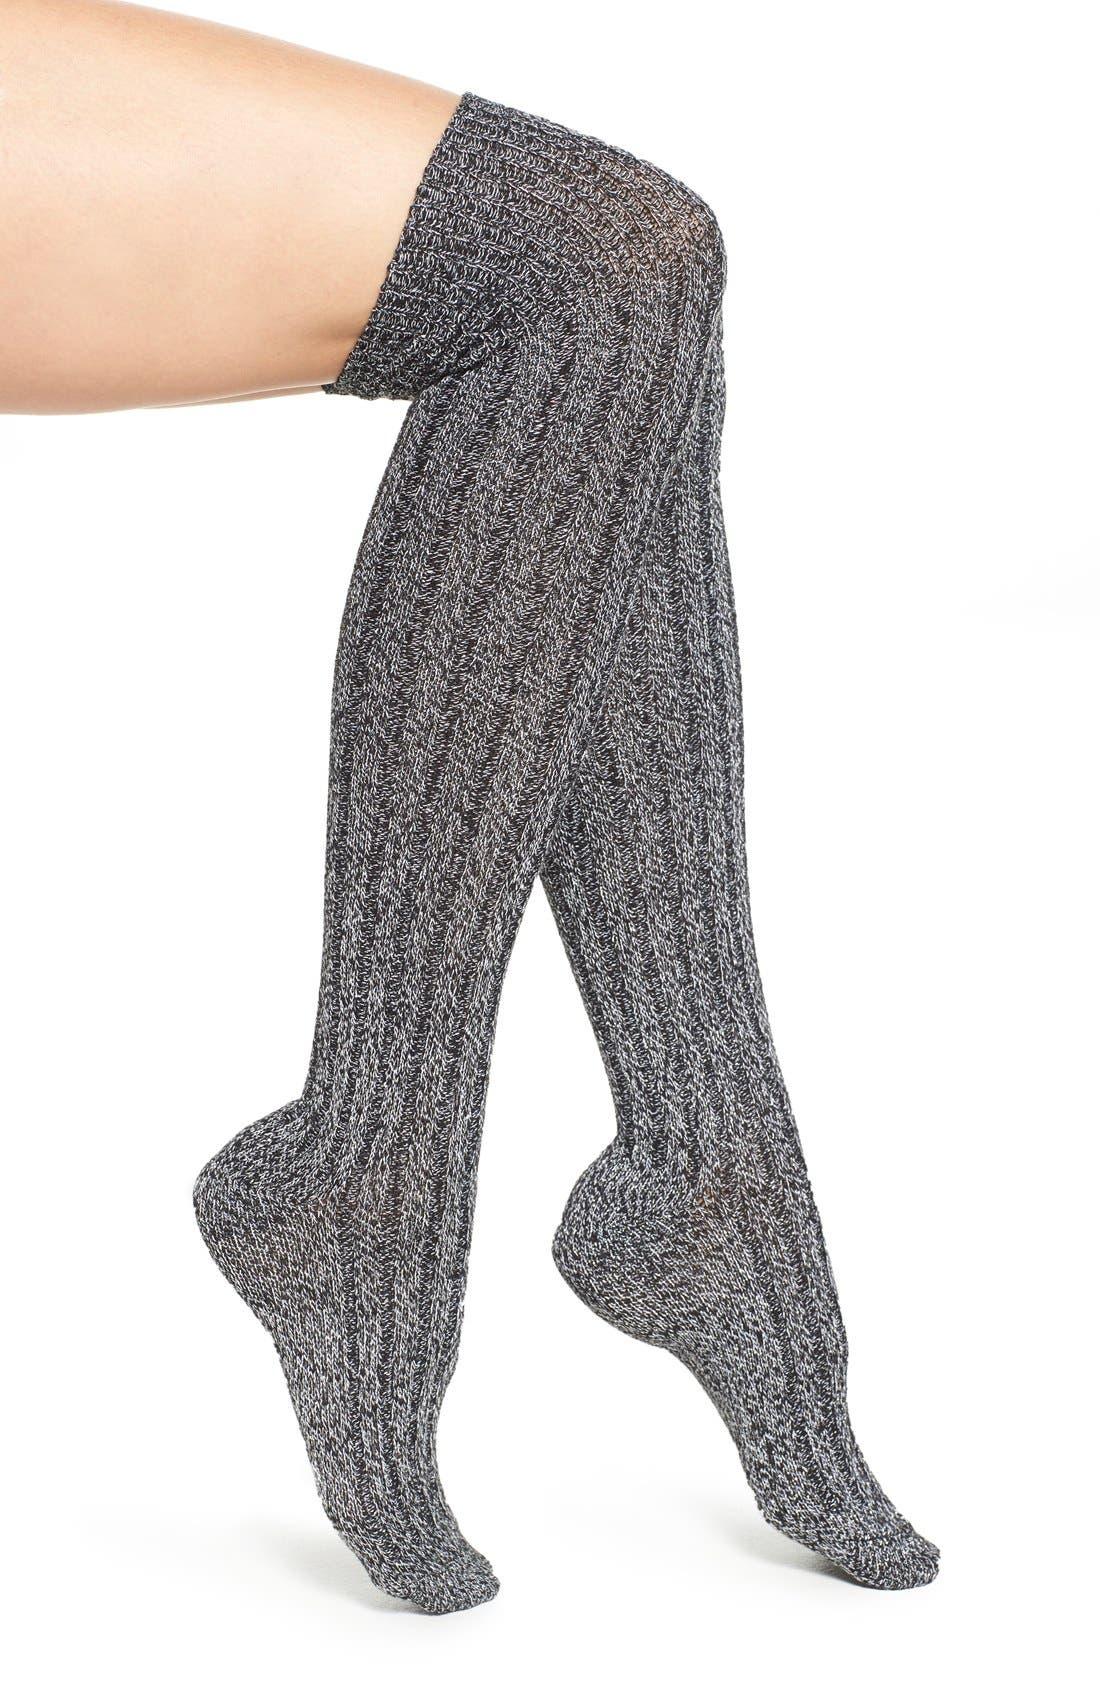 Alternate Image 1 Selected - Nordstrom Sparkle Knit Over the Knee Socks